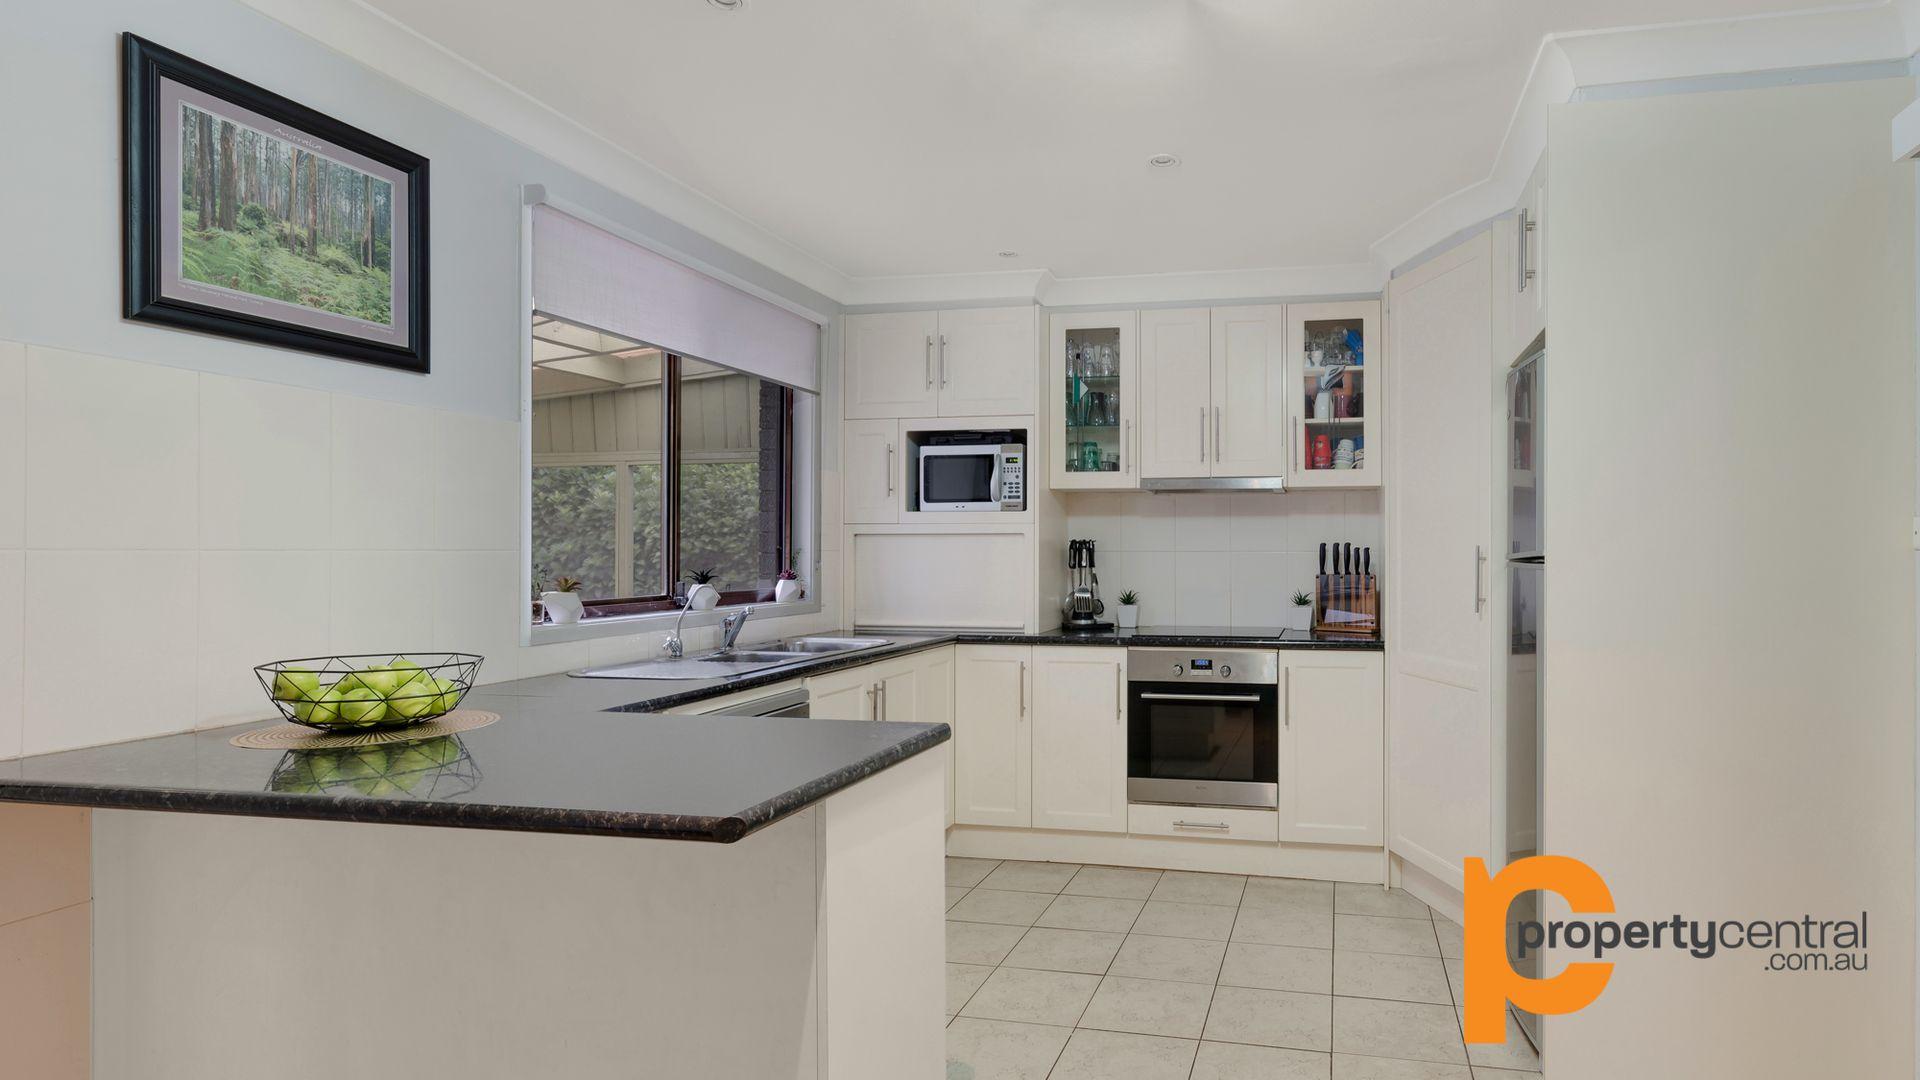 58 Allard Street, Penrith NSW 2750, Image 1